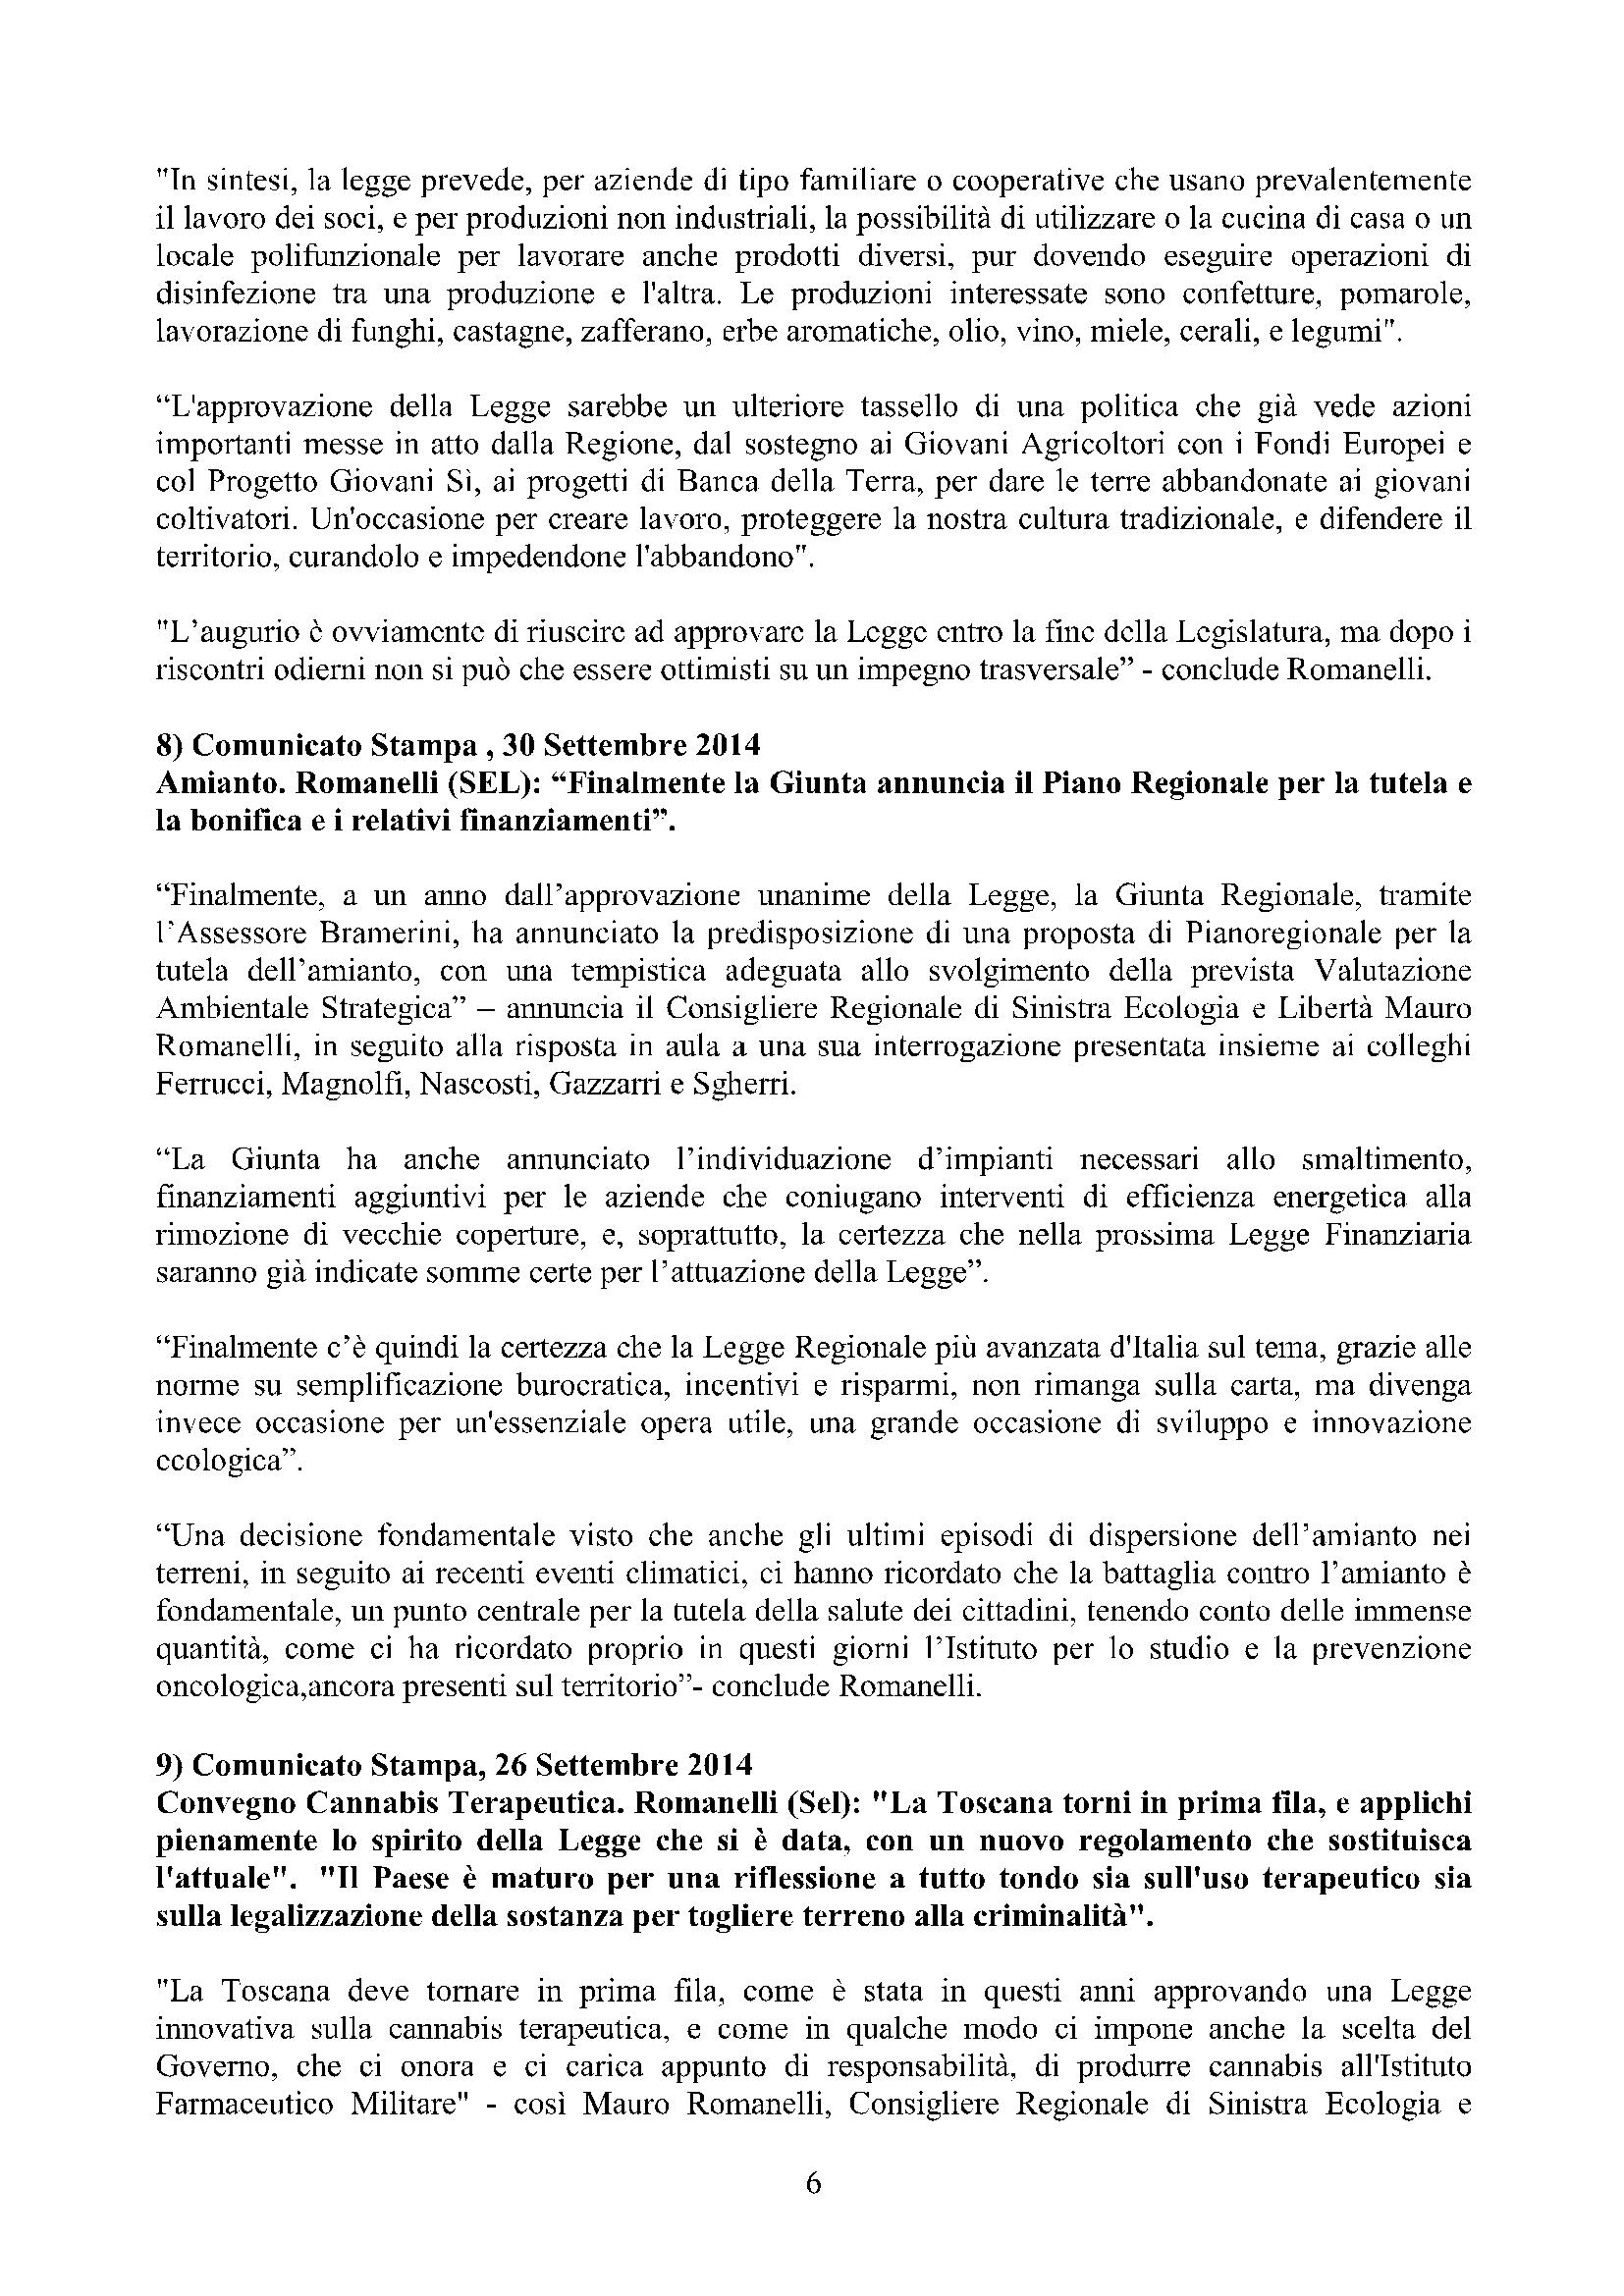 Newsletter di MAURO ROMANELLI Ottobre 2014 -6